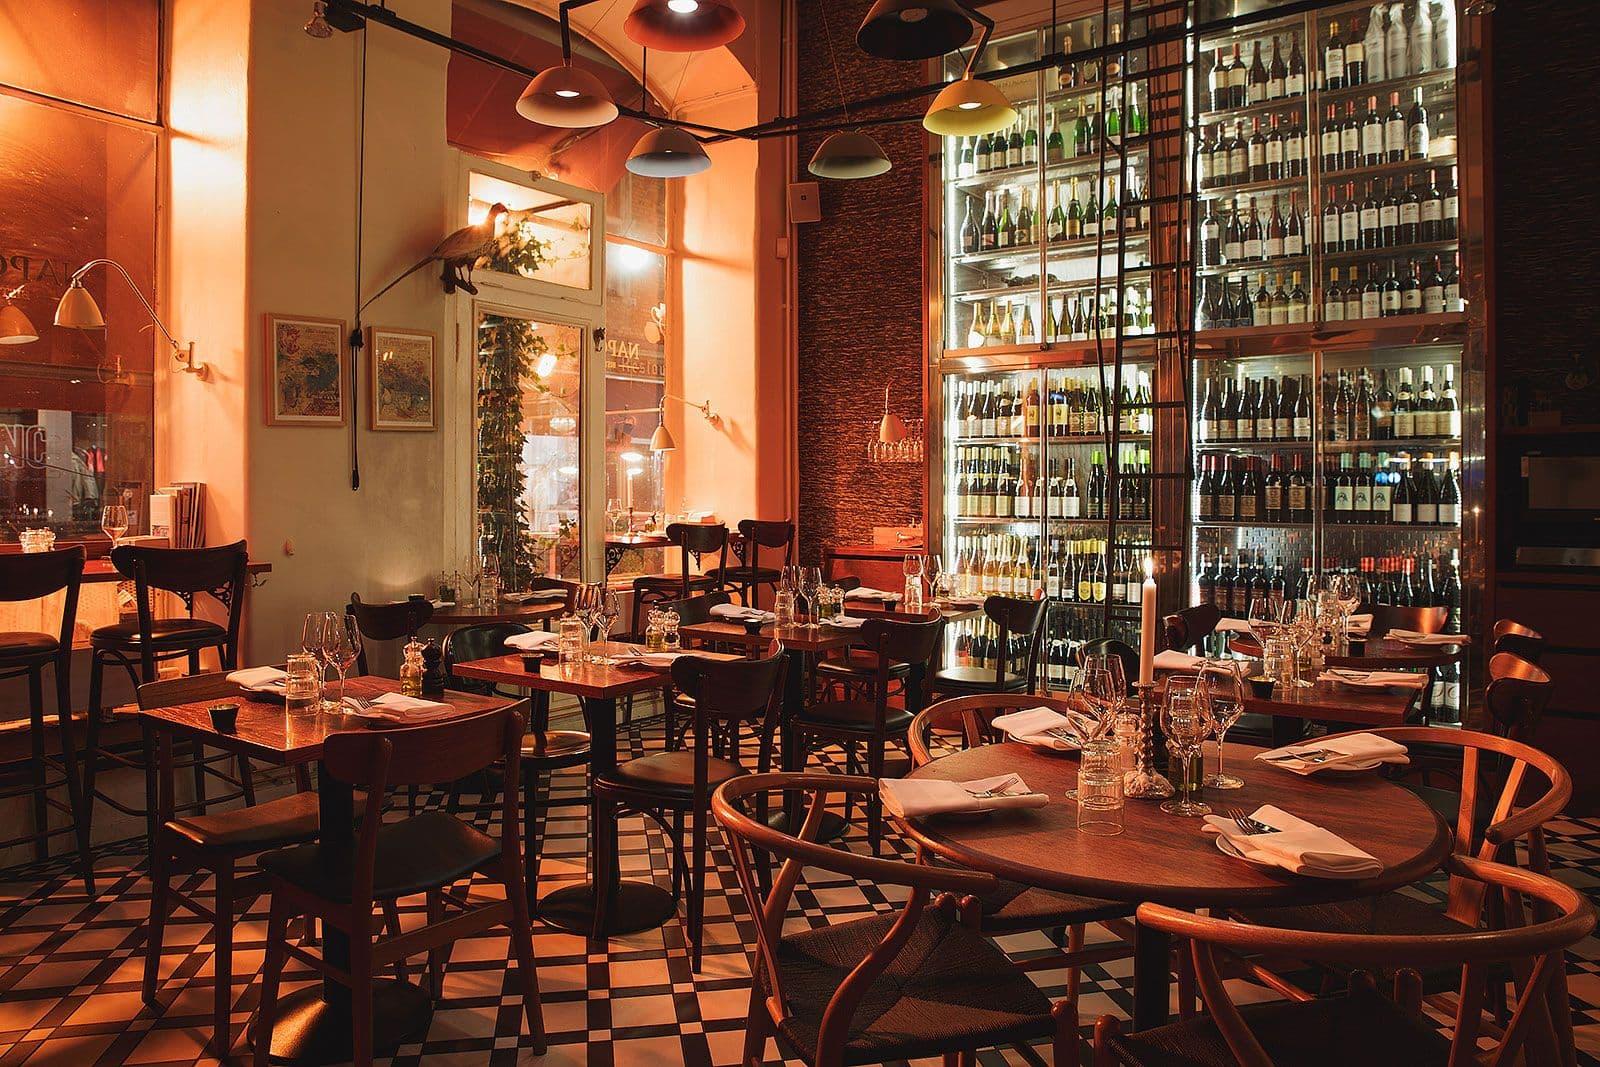 Fransk restaurang gamla stan